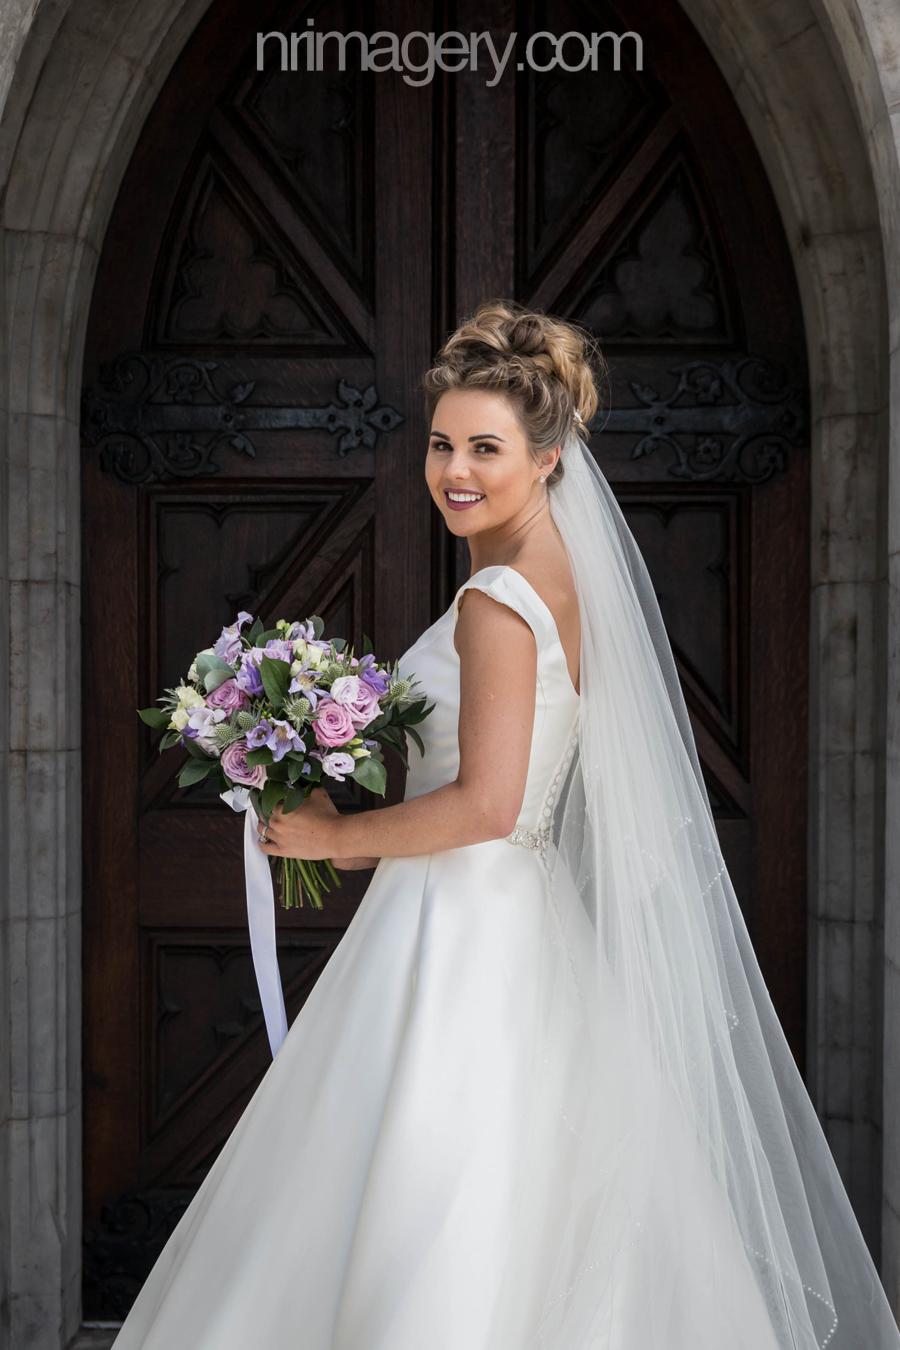 North Wales Wedding Photographery